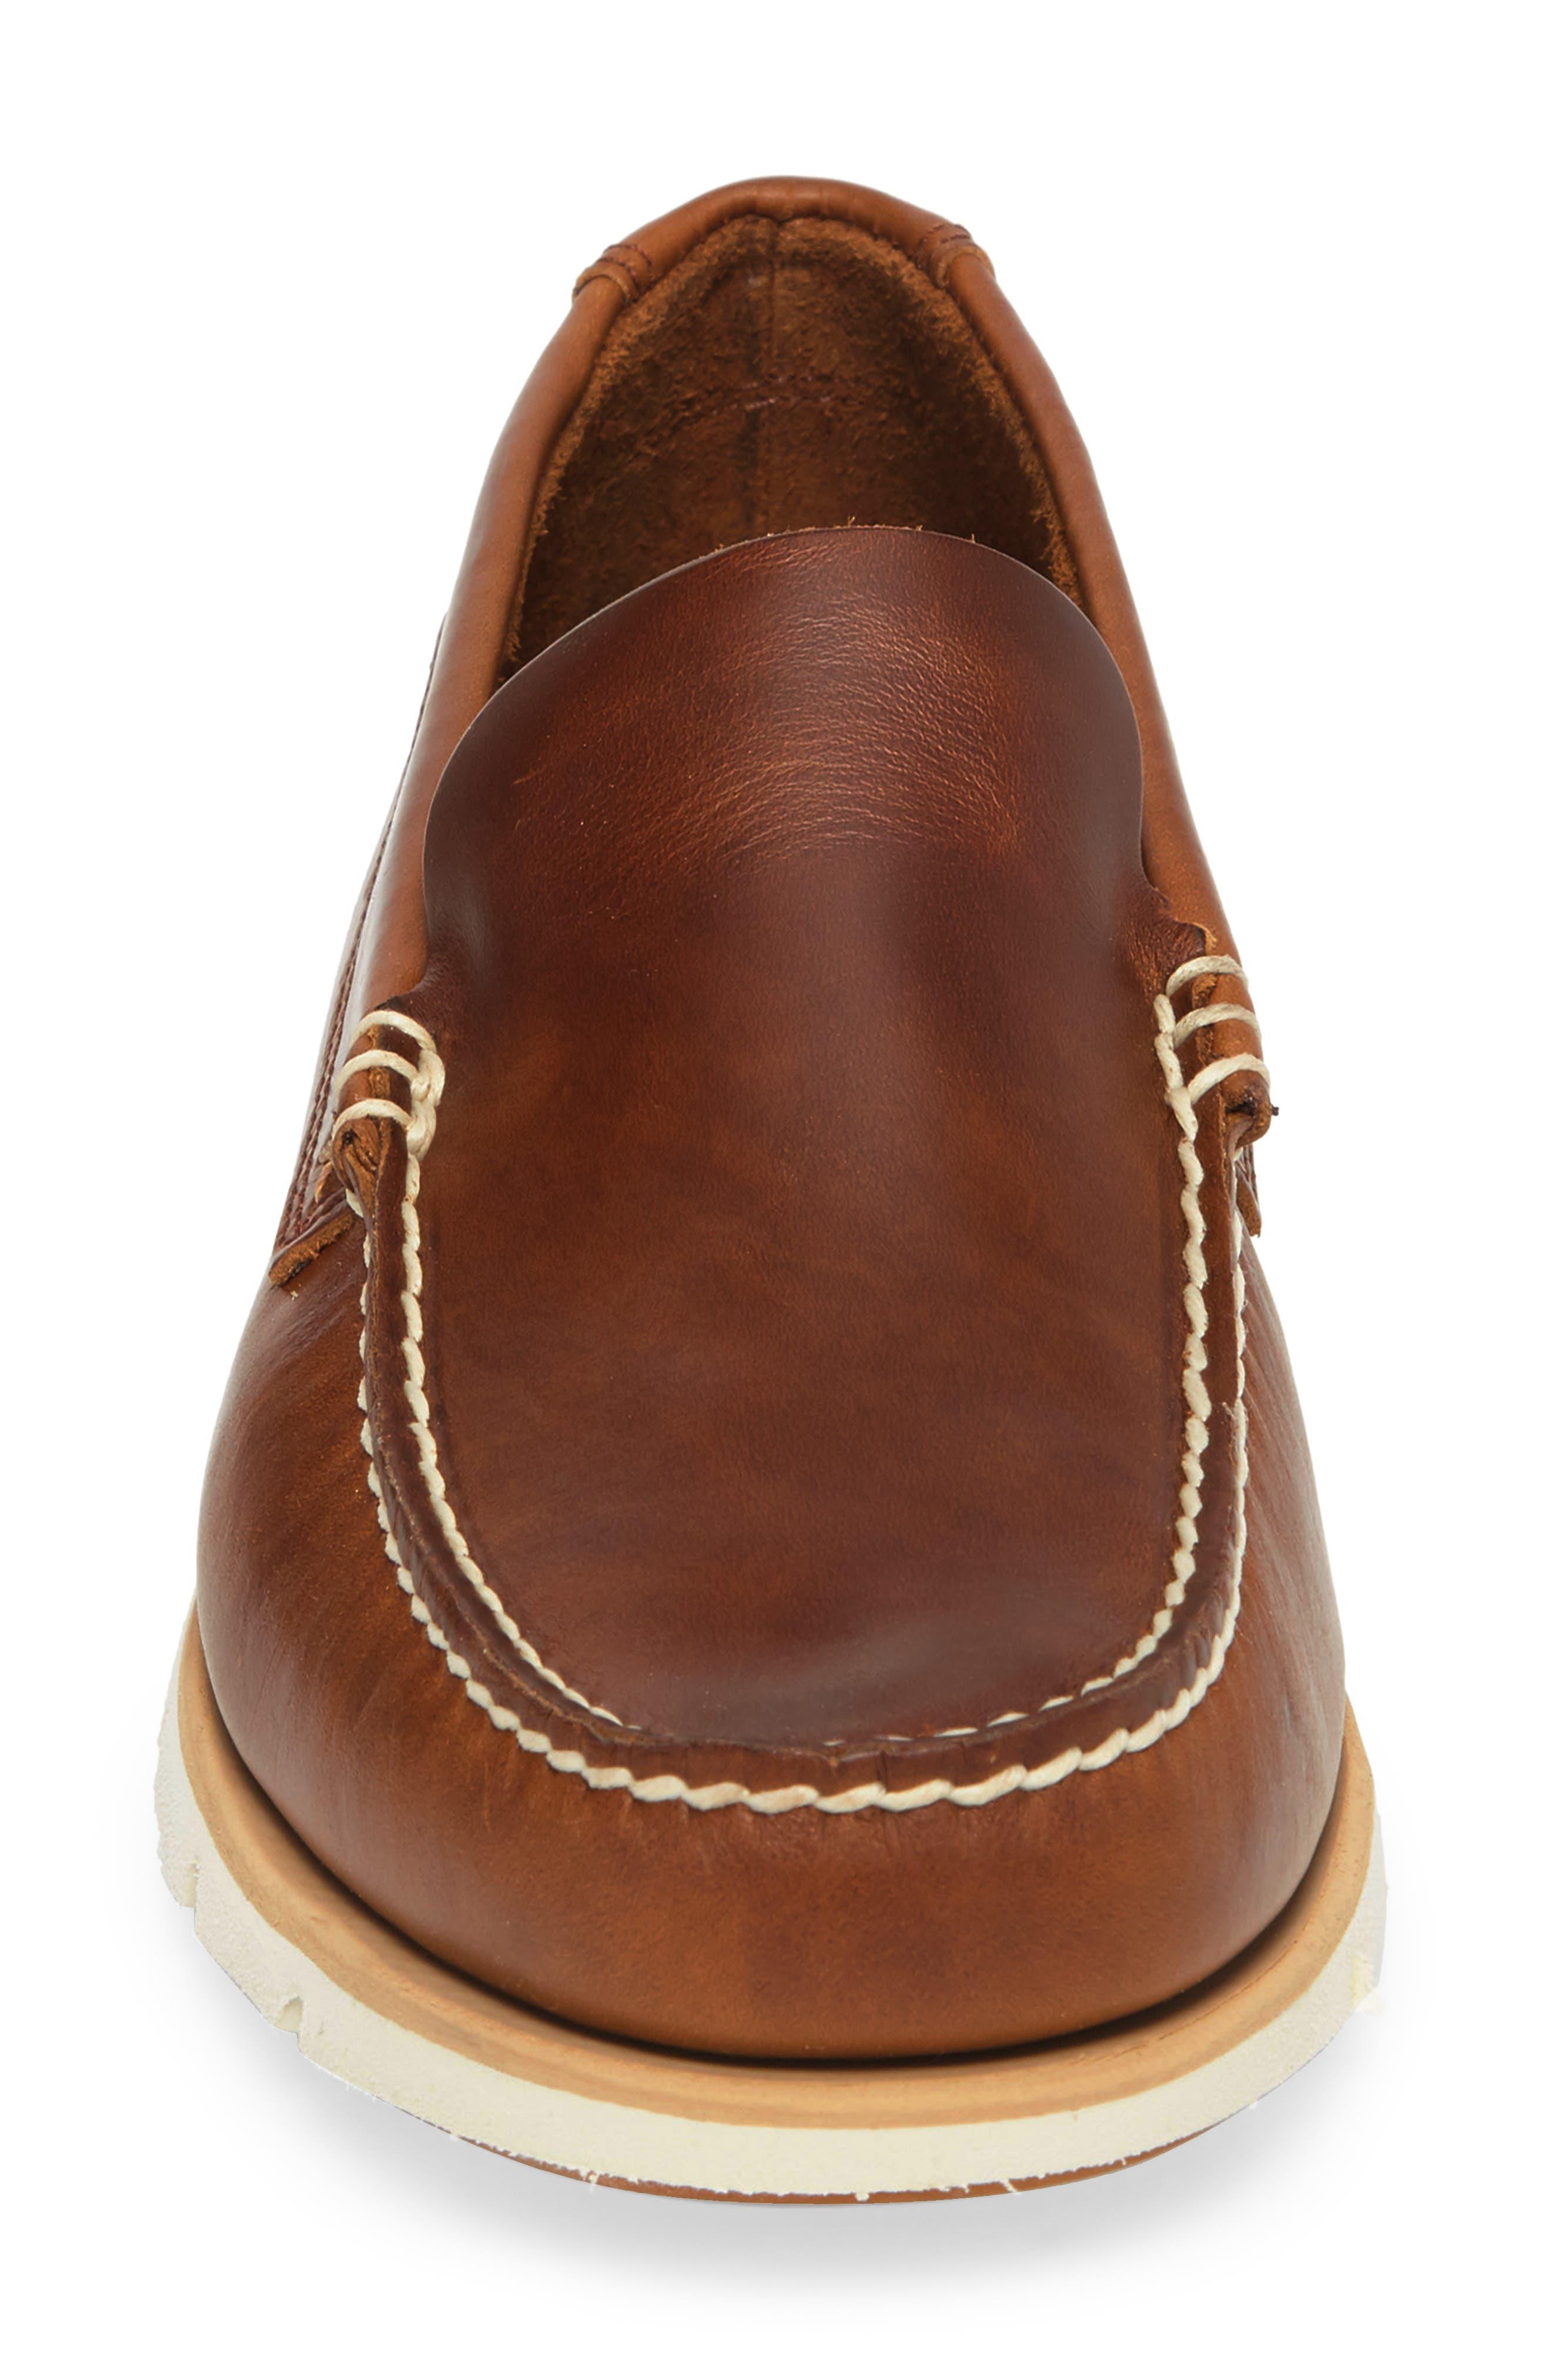 Tidelands Venetian Loafer,                             Alternate thumbnail 4, color,                             Brown